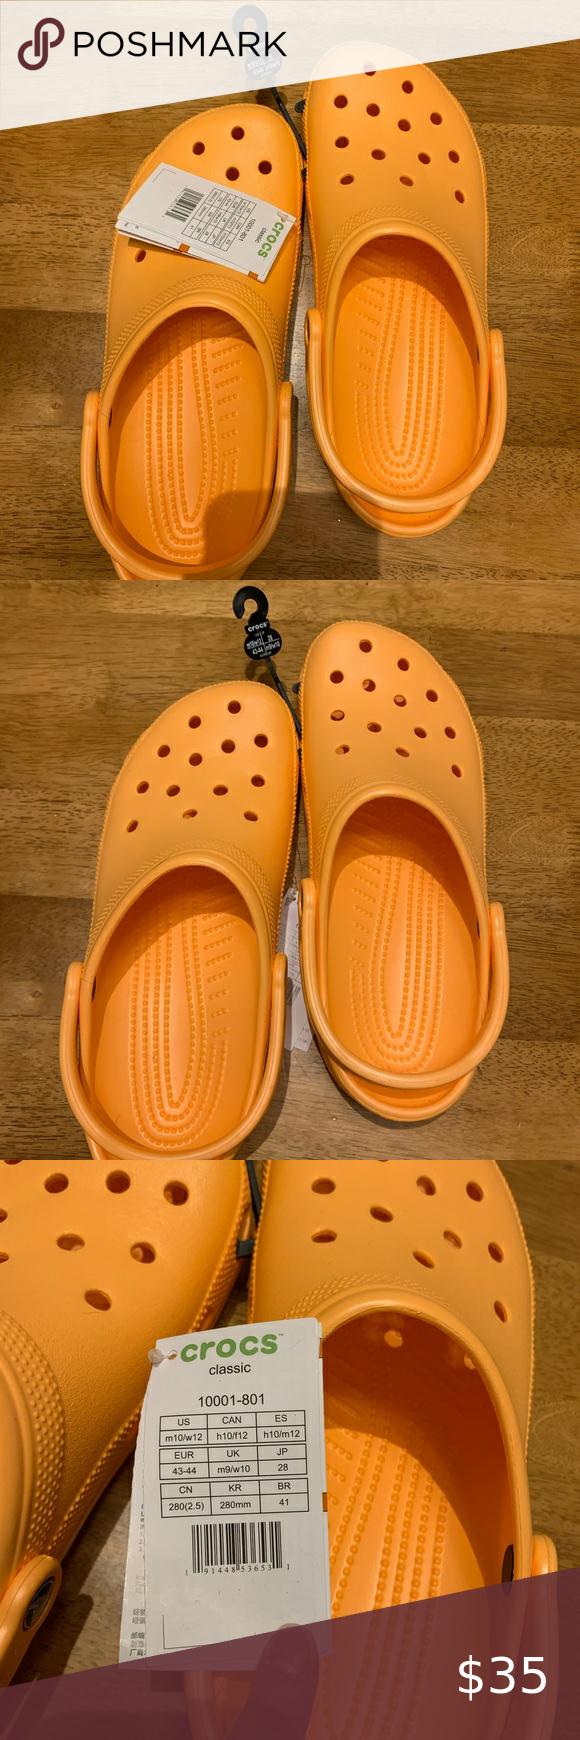 Crocs Women S12 Men S10 Cantaloupe New Brand New Crocs Cantaloupe Color Men Size 10 Women Size 12 Crocs Shoes Crocs Women S Crocs Size 10 Women Zapatos crocs online para mujer. crocs women s12 men s10 cantaloupe new